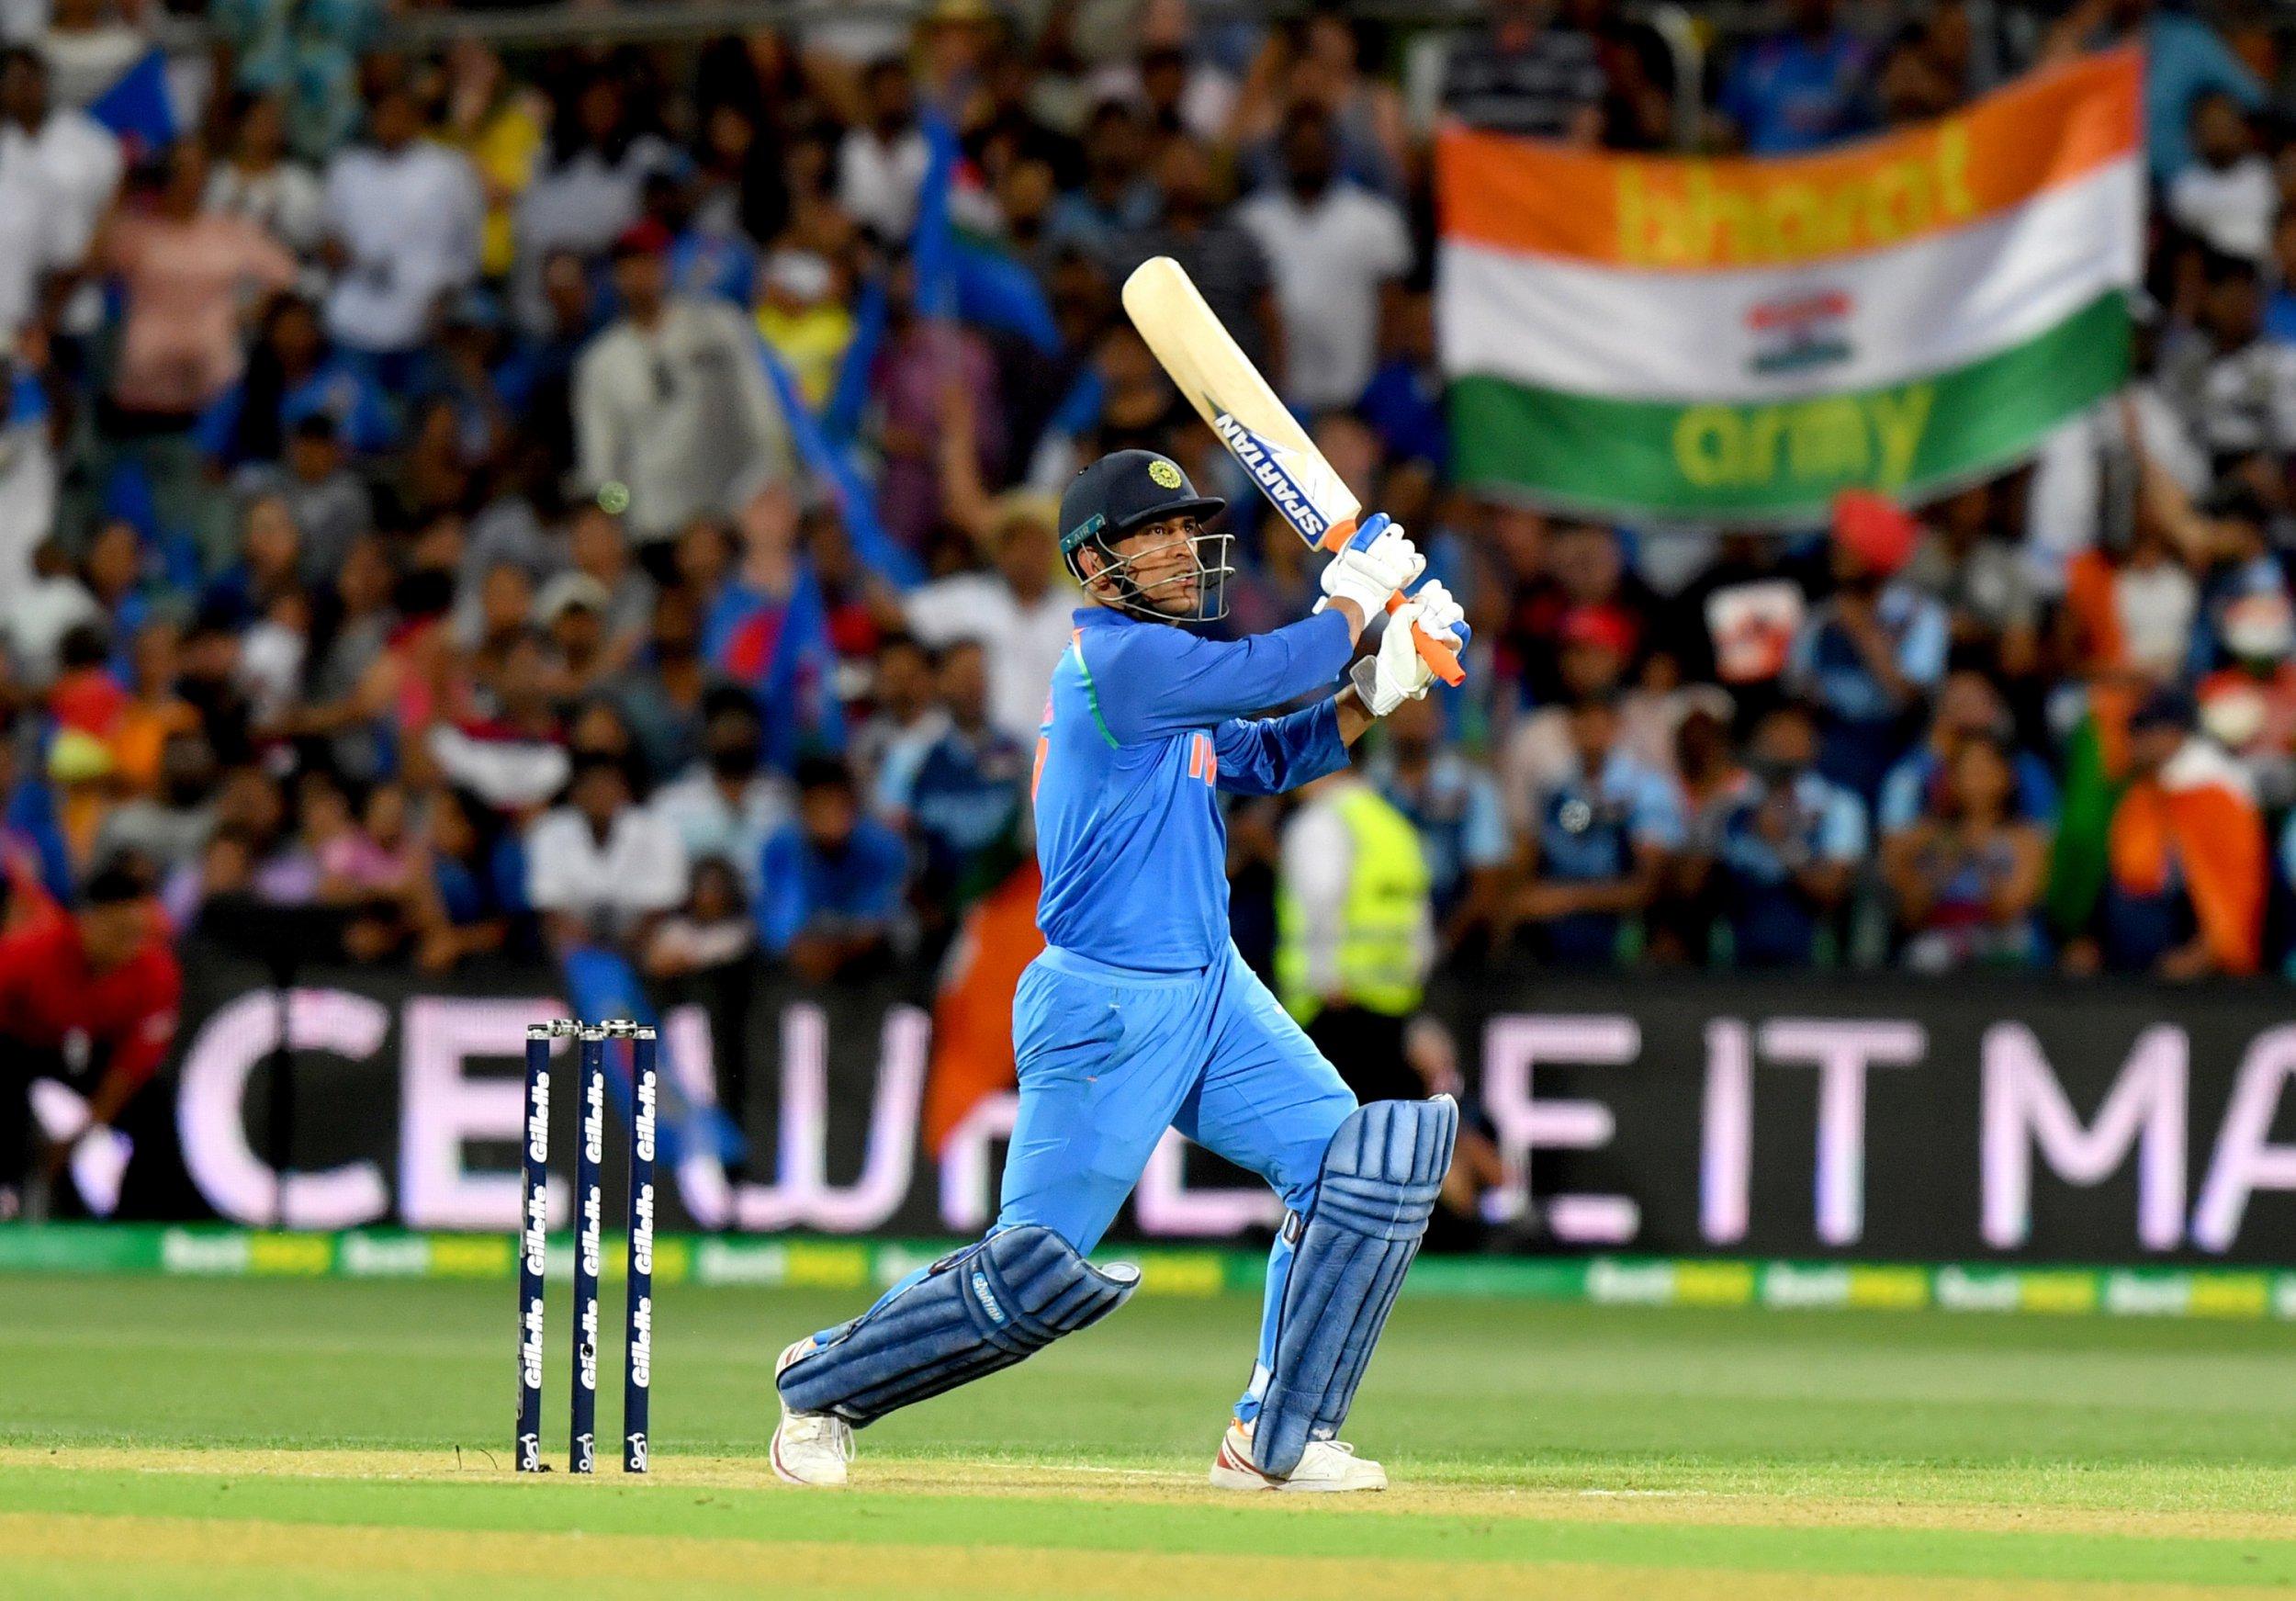 Virat Kohli pays tribute to MS Dhoni after India beat Australia to level series